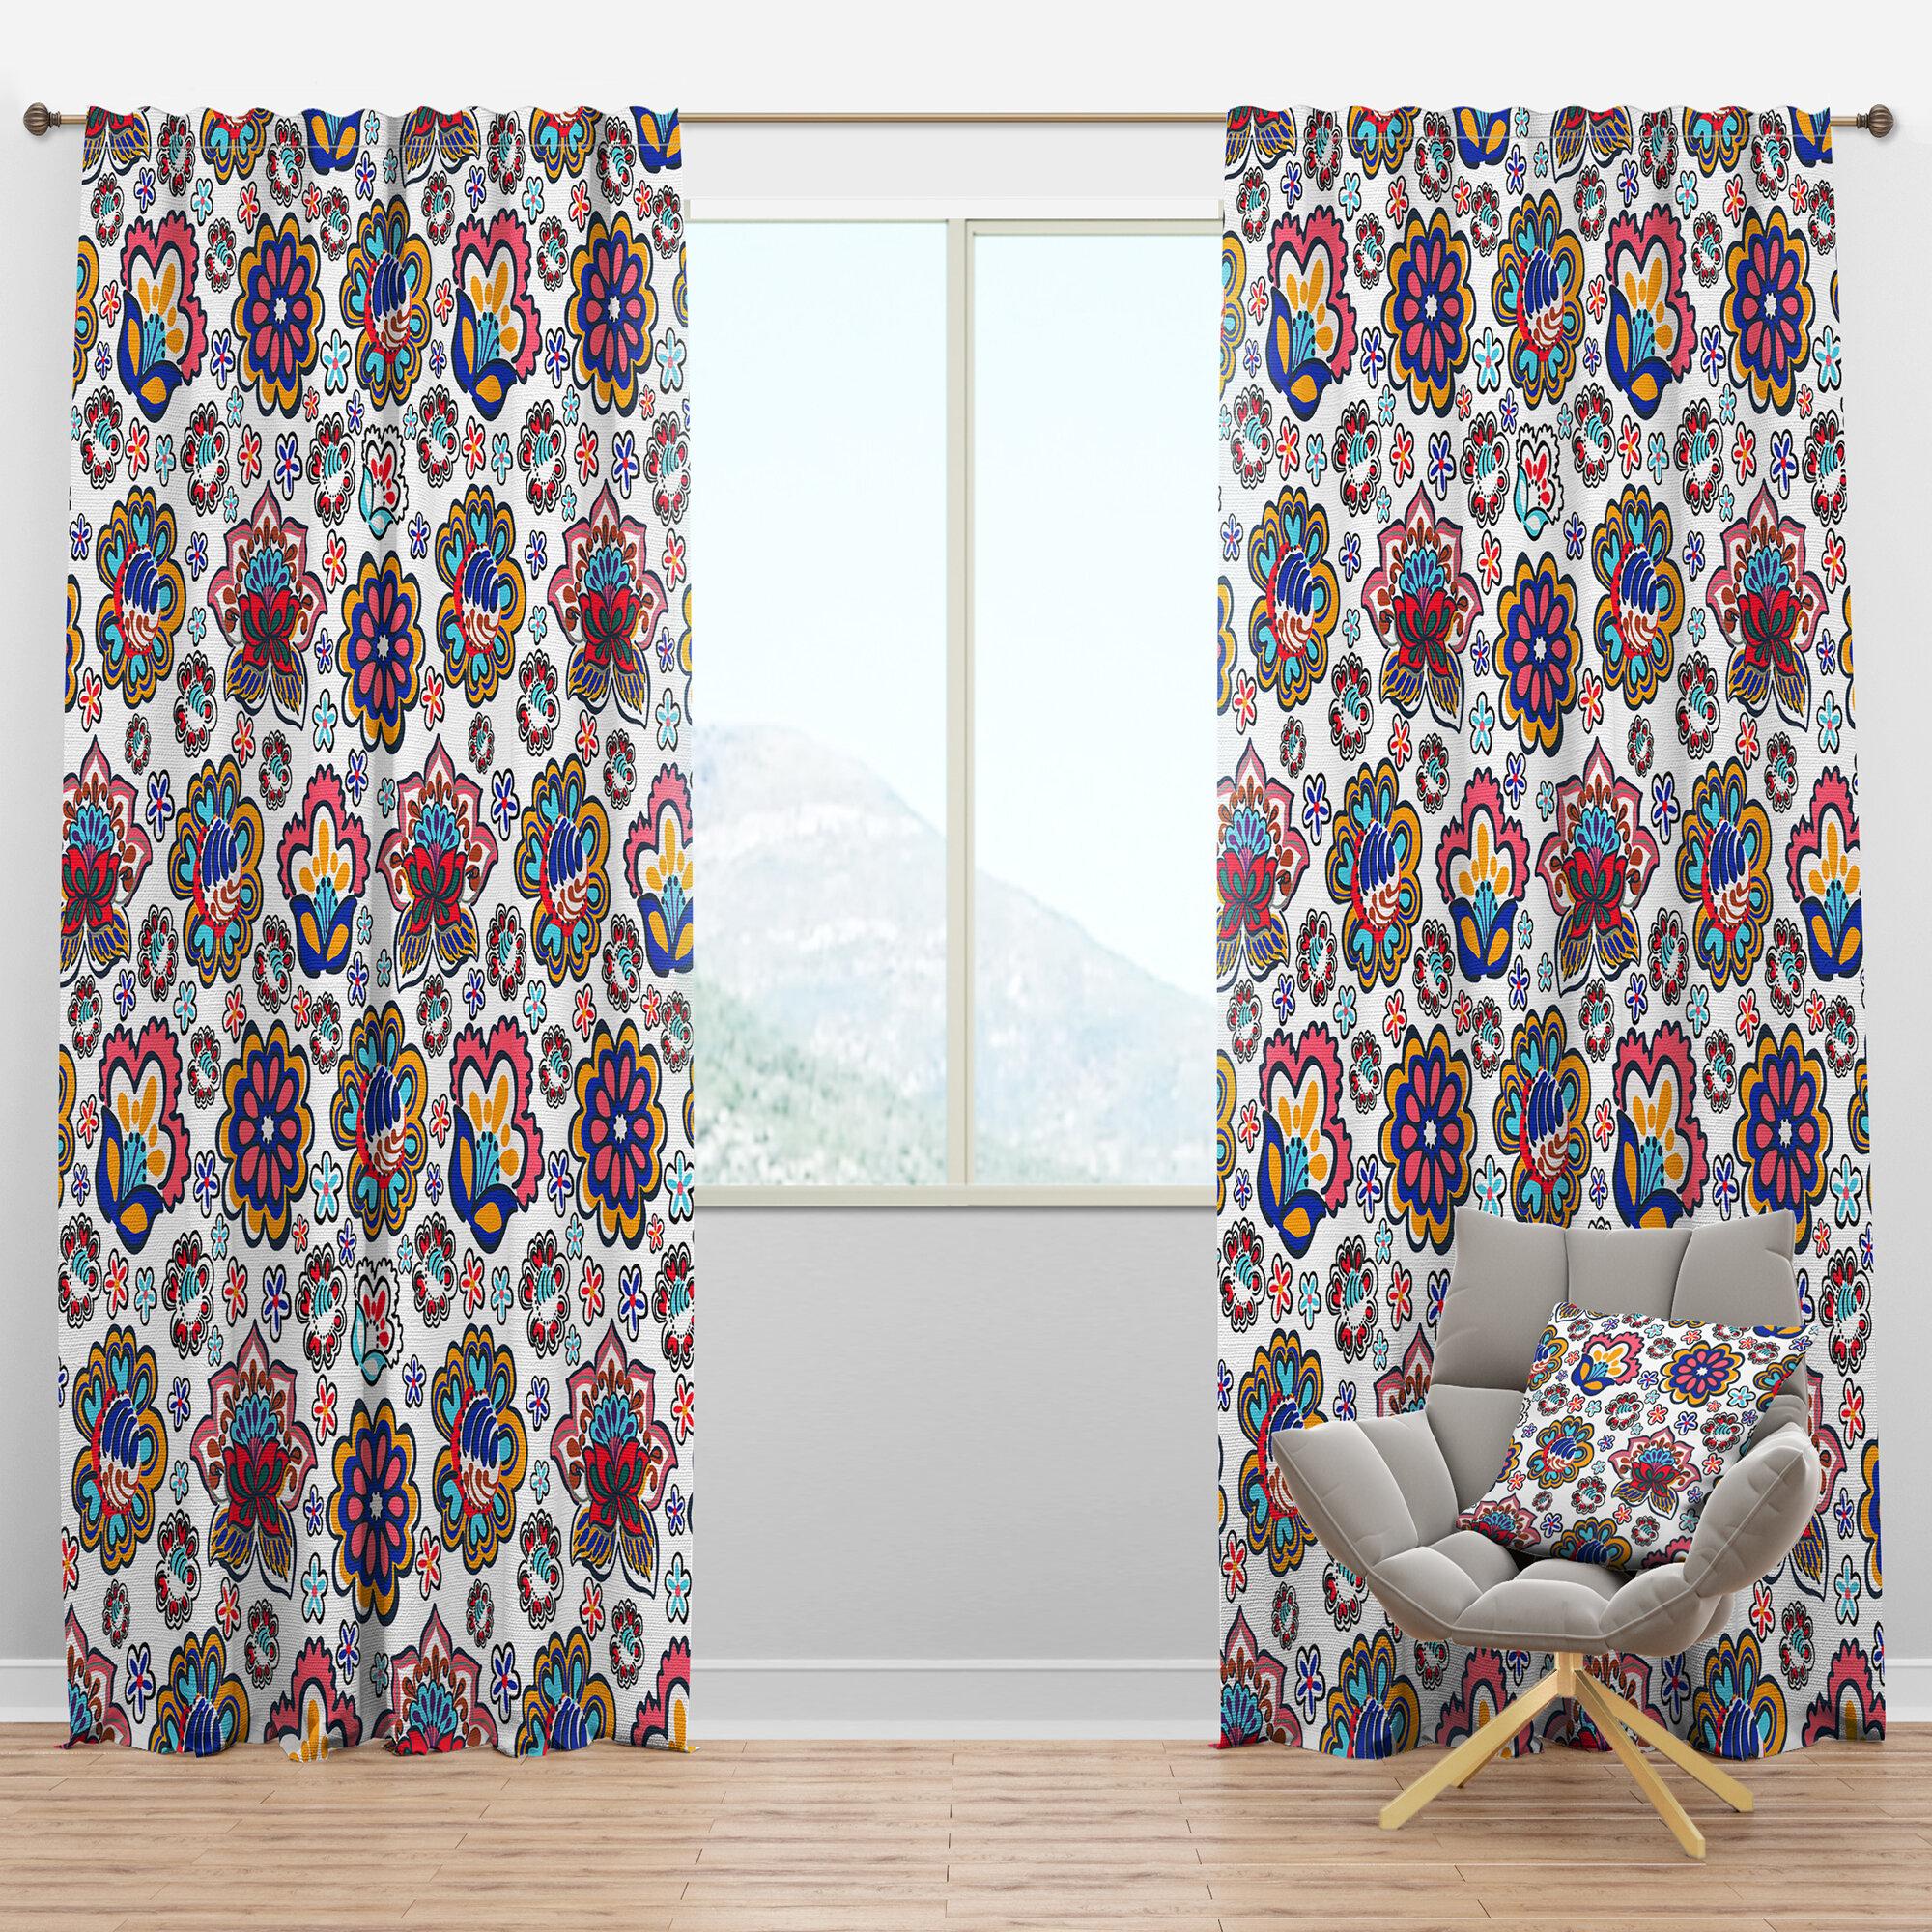 Designart Mid Century Handdrawn Ii Floral Semi Sheer Thermal Rod Pocket Curtain Panels Wayfair